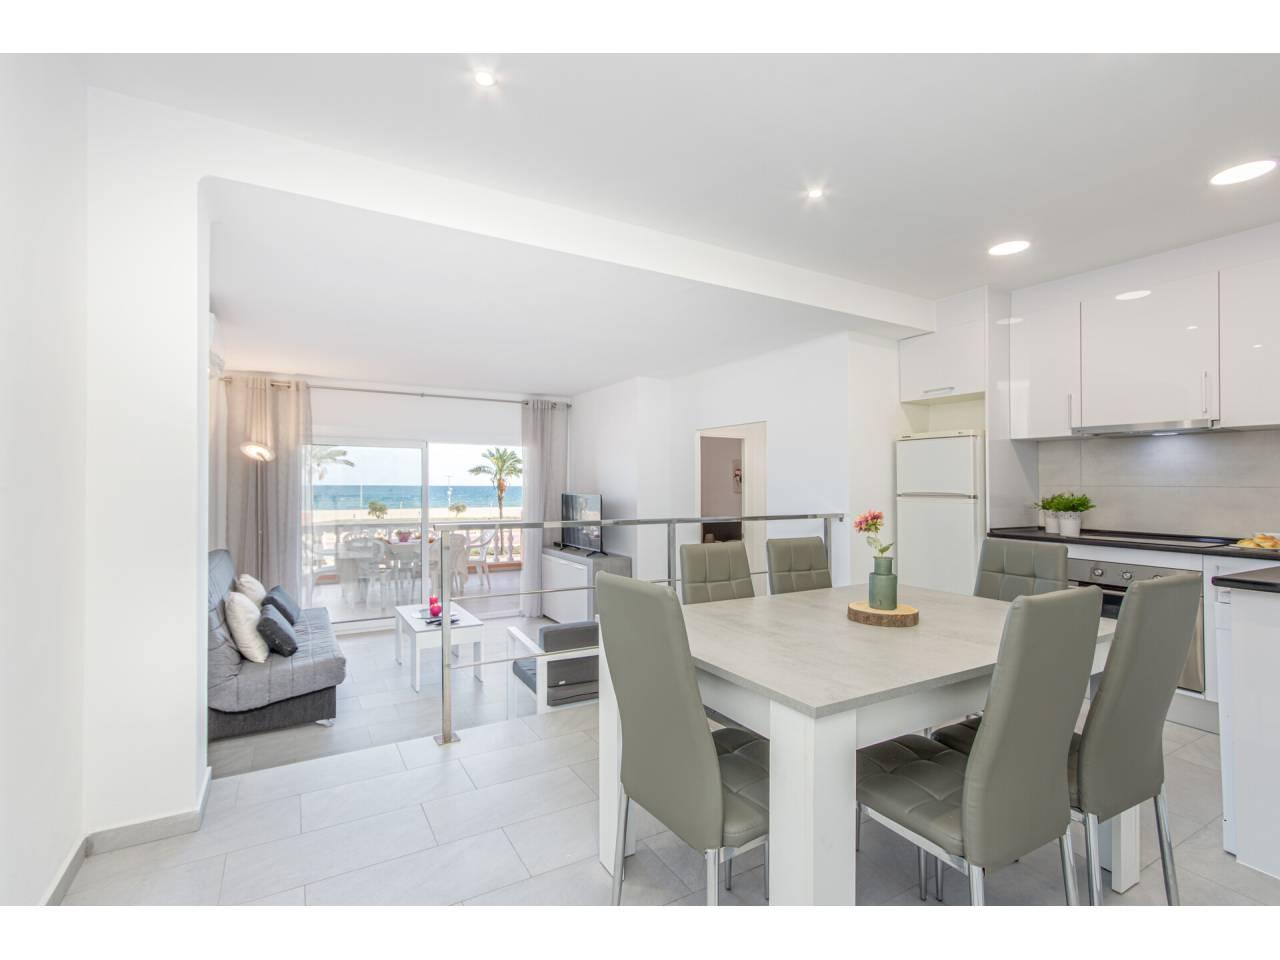 880076 - Apartment for short-term rental in Empuriabrava